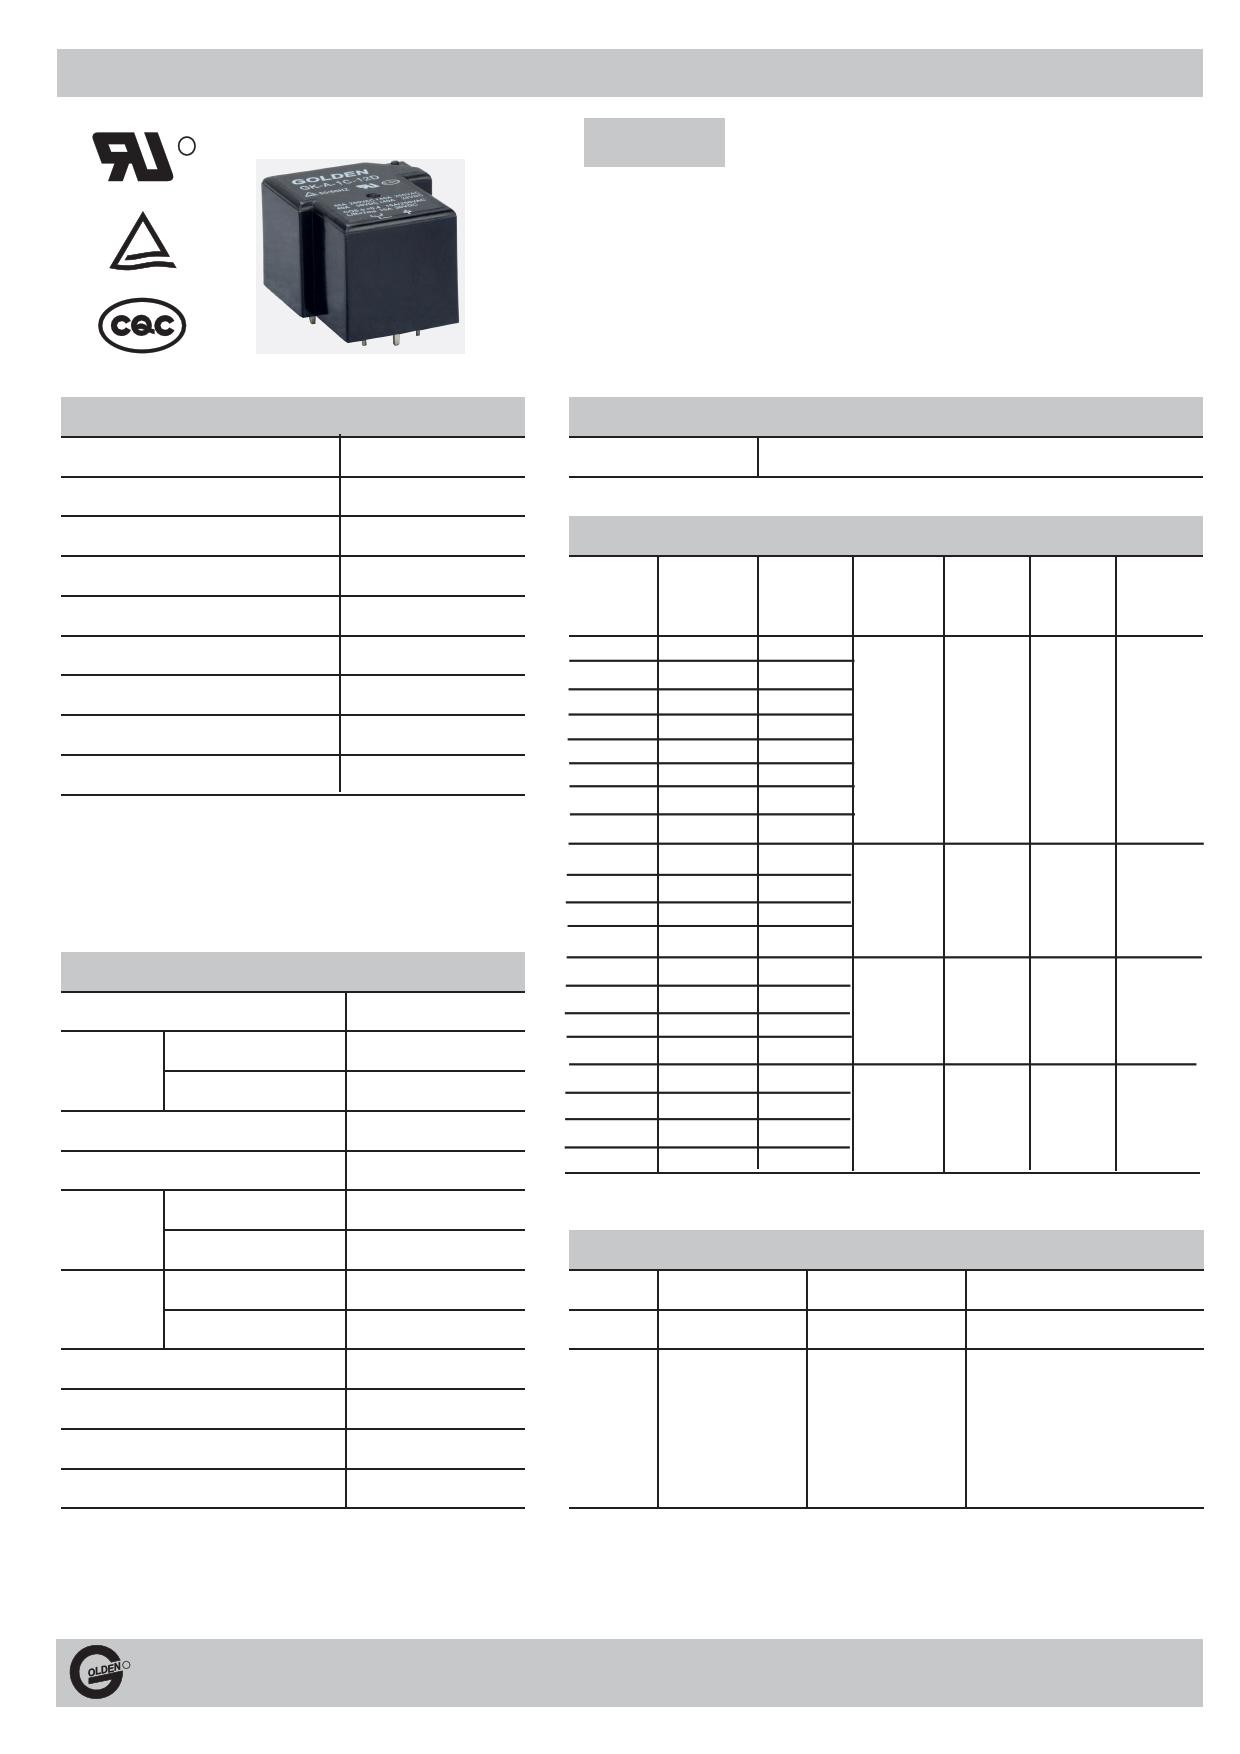 GK-A-1C دیتاشیت PDF